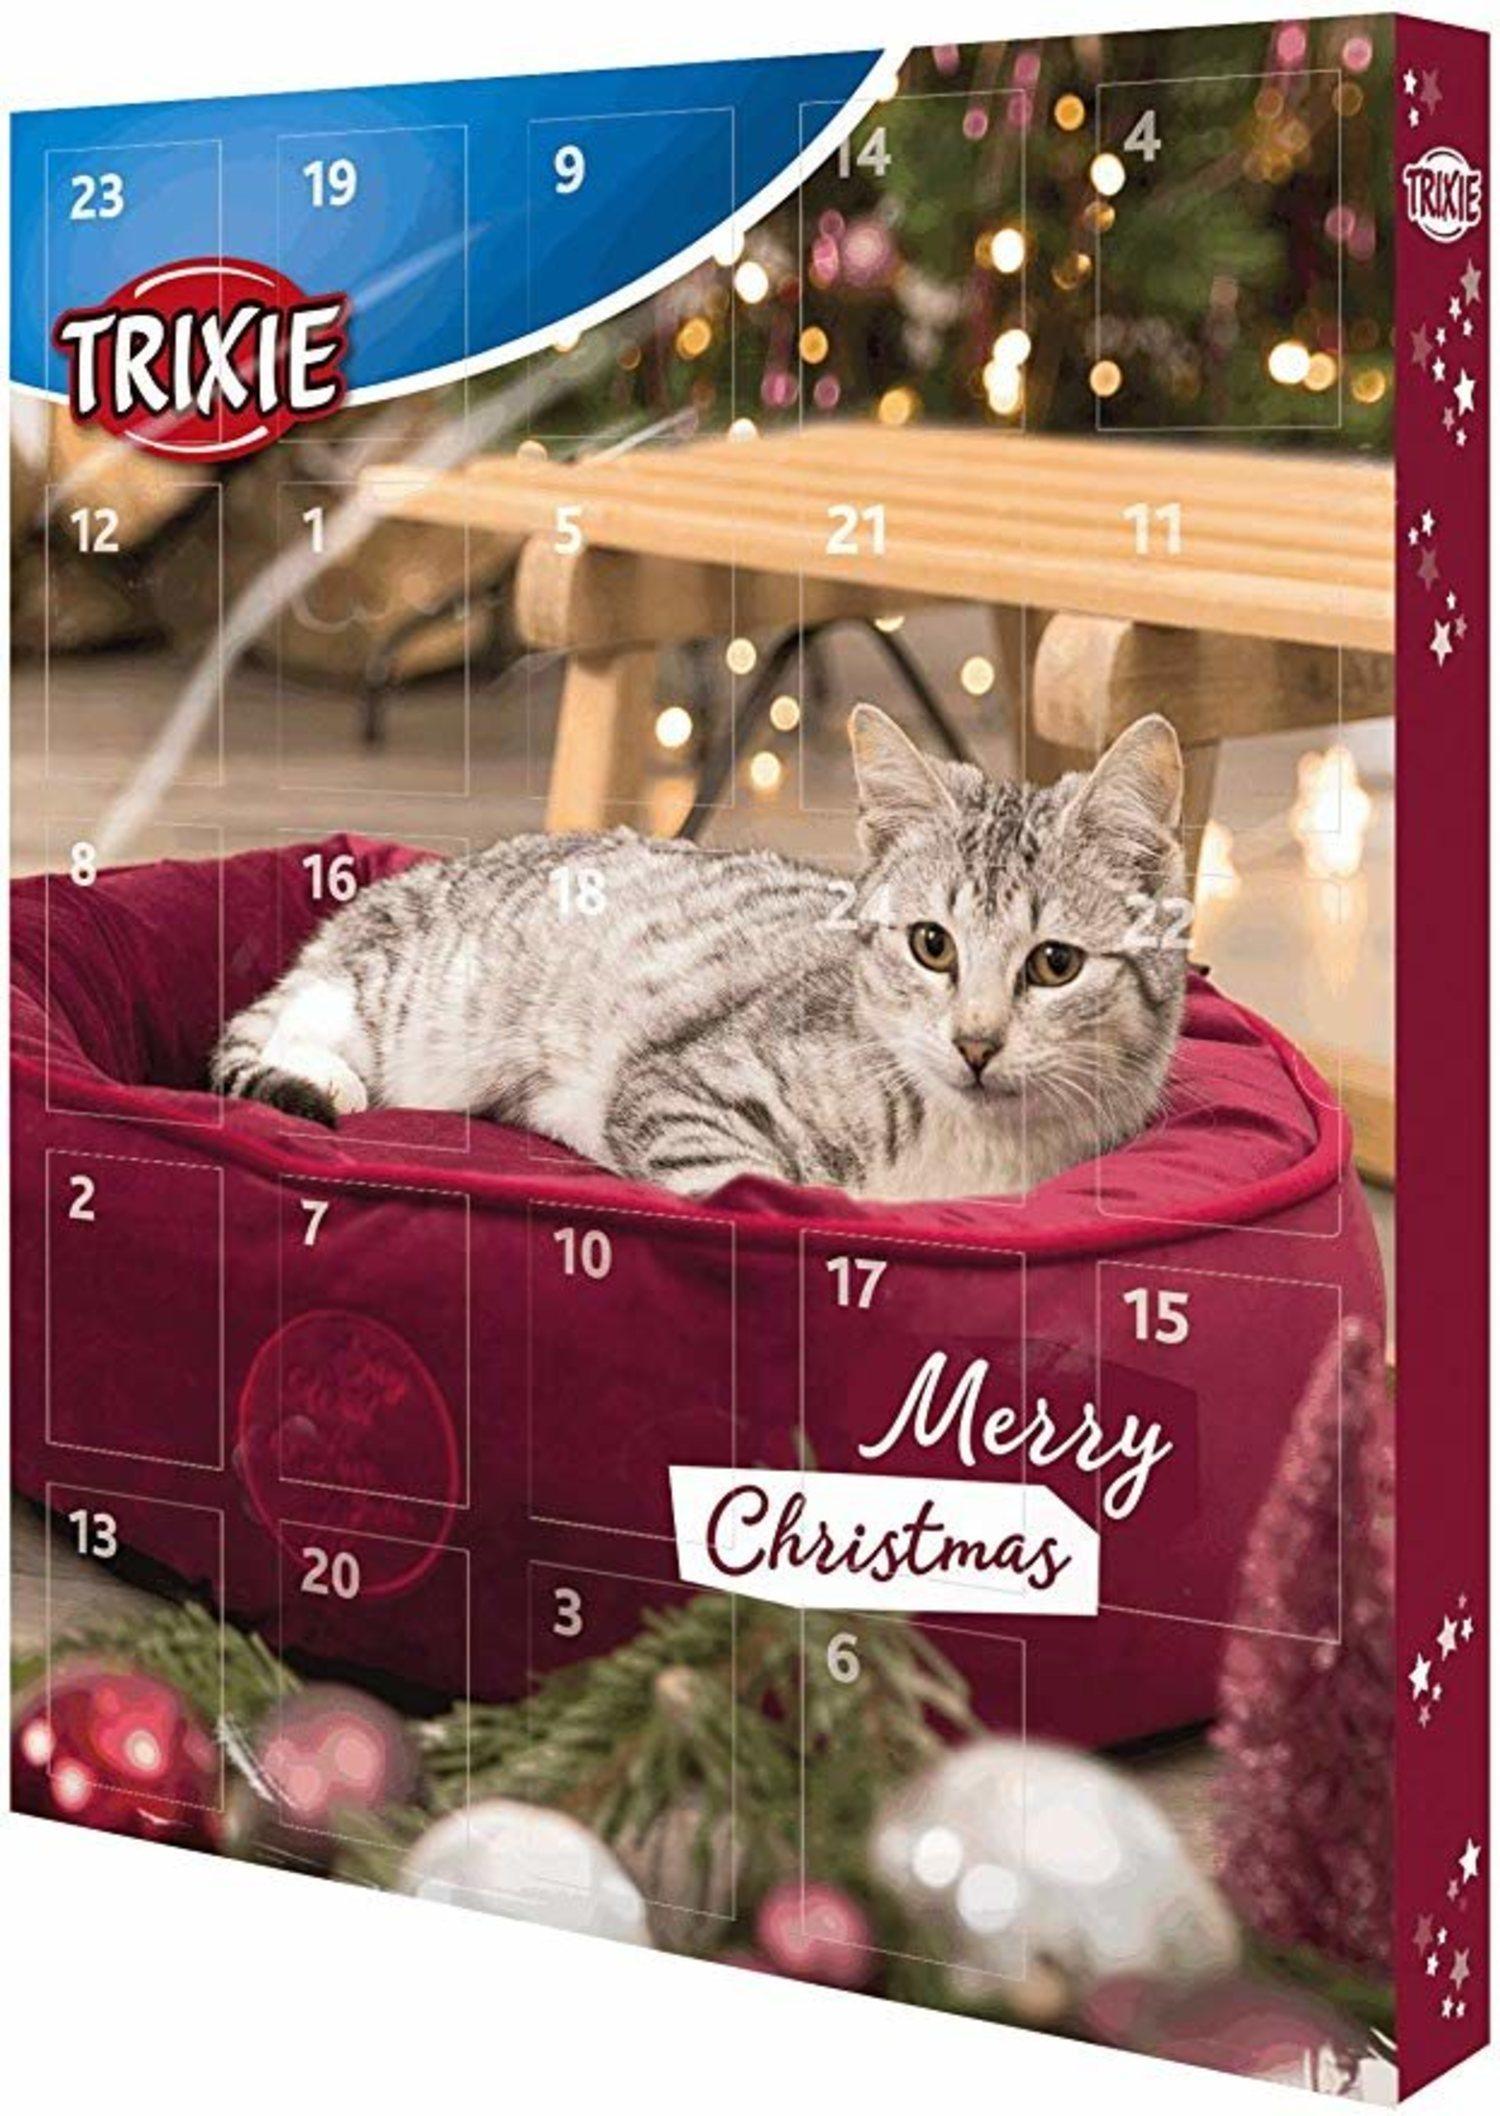 Calendario de adviento Trixie.